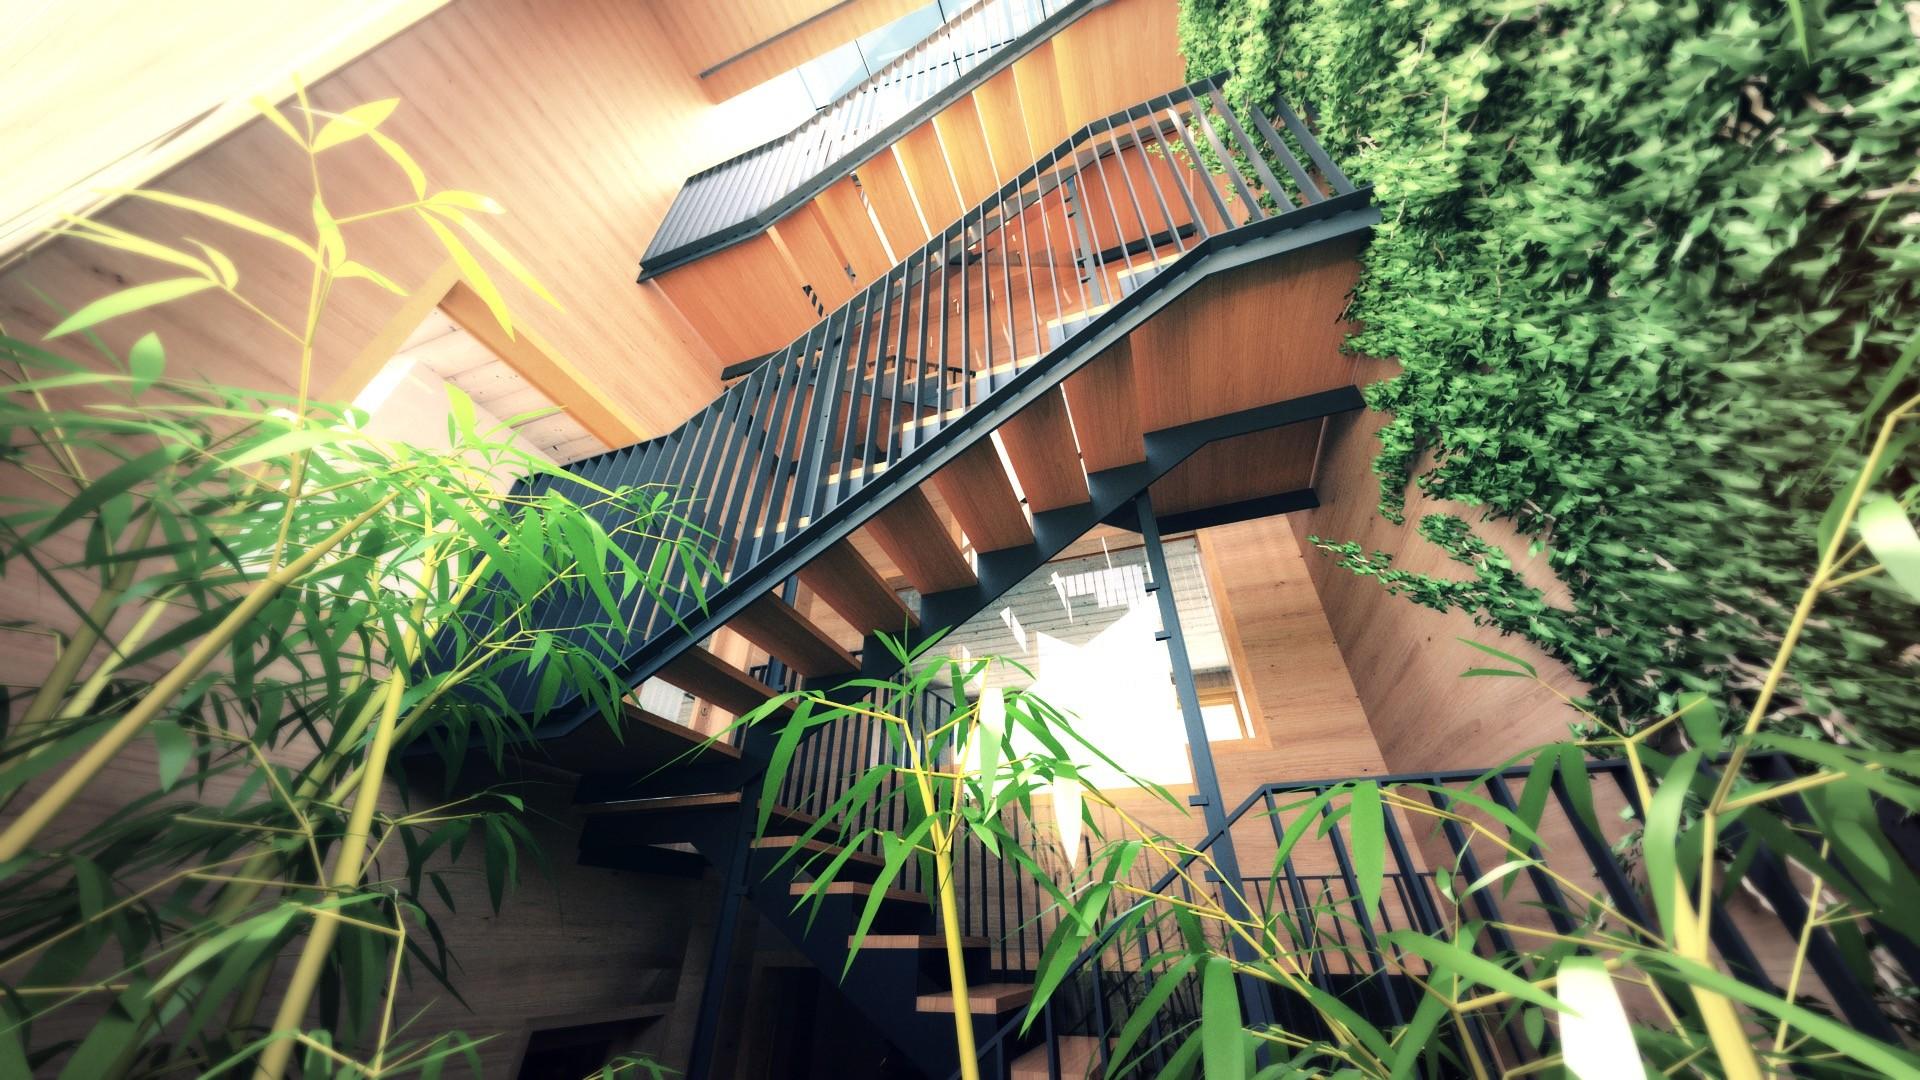 Duane kemp 27 a1309 villas portier 3d staircase garage staircase 1rst floor 01 b post 02